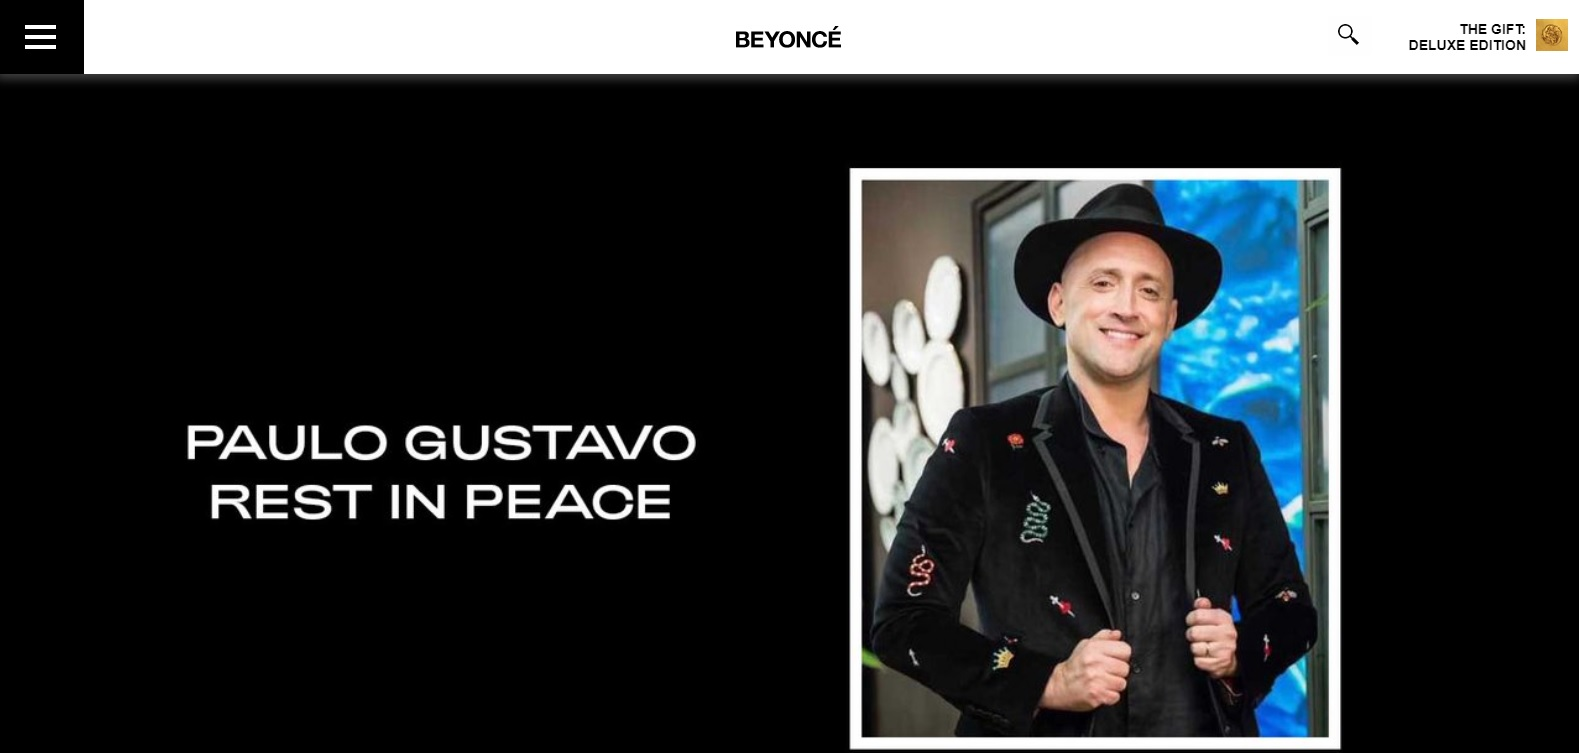 Beyoncé presta homenagem a Paulo Gustavo